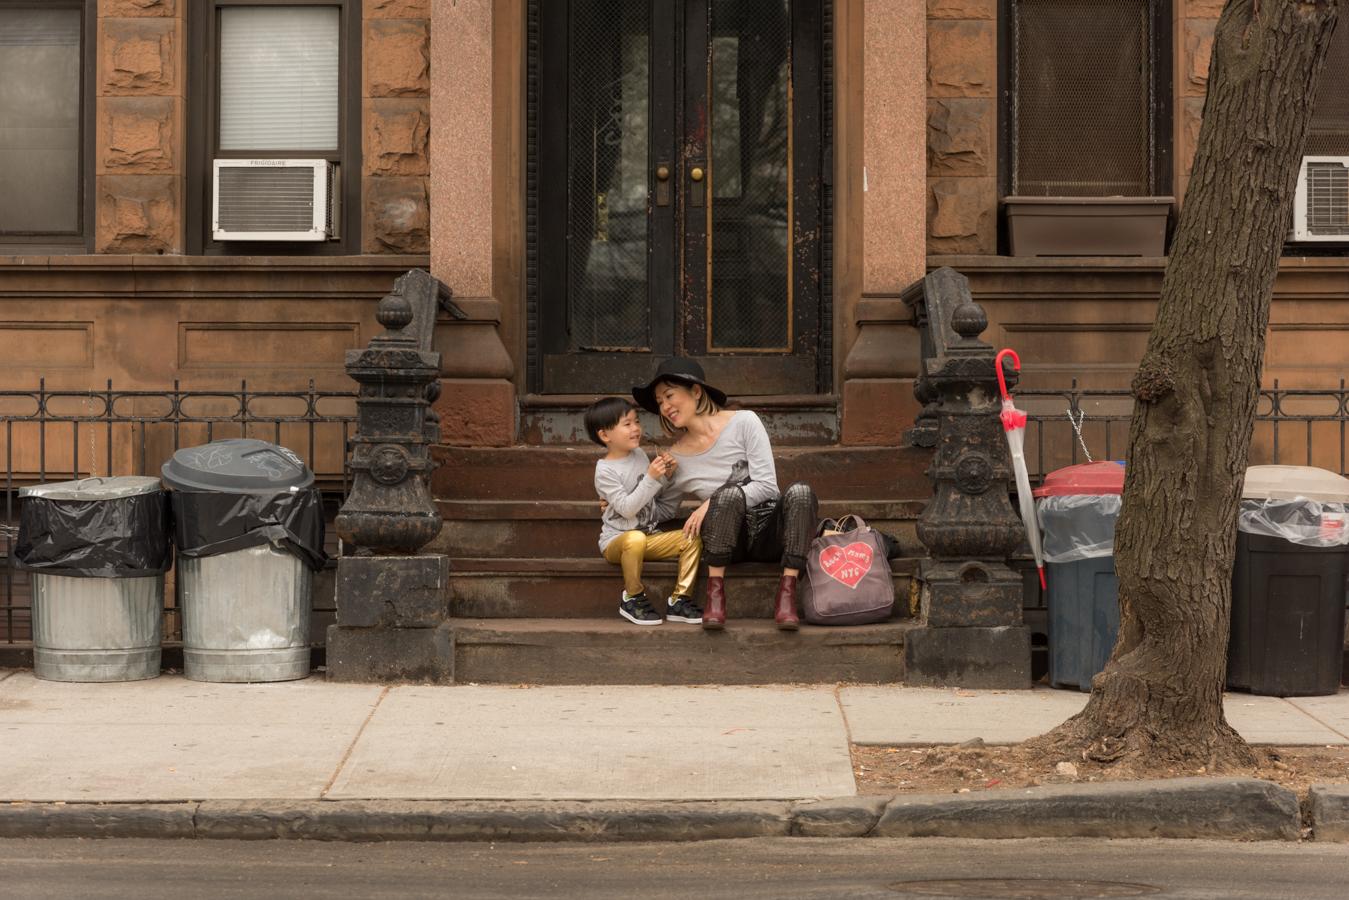 ROCK MAMA NYC LIFESTYLE BLOG -  MOM AND SON MATCHING T-SHIRTS STYLING